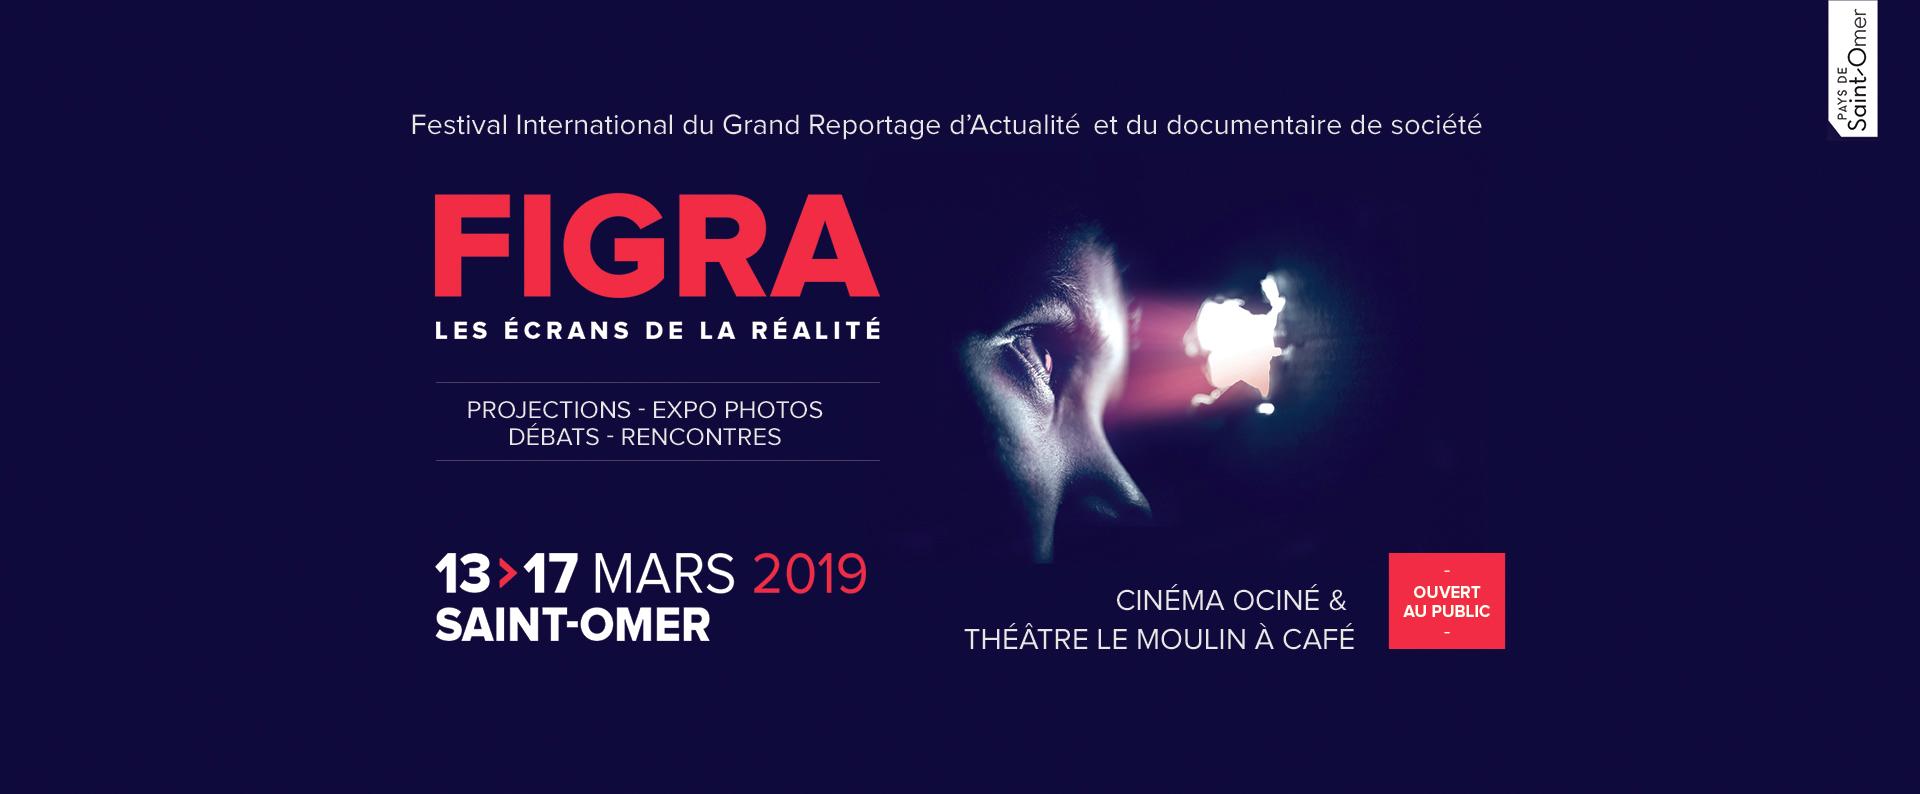 slide-figra-accueil-2019